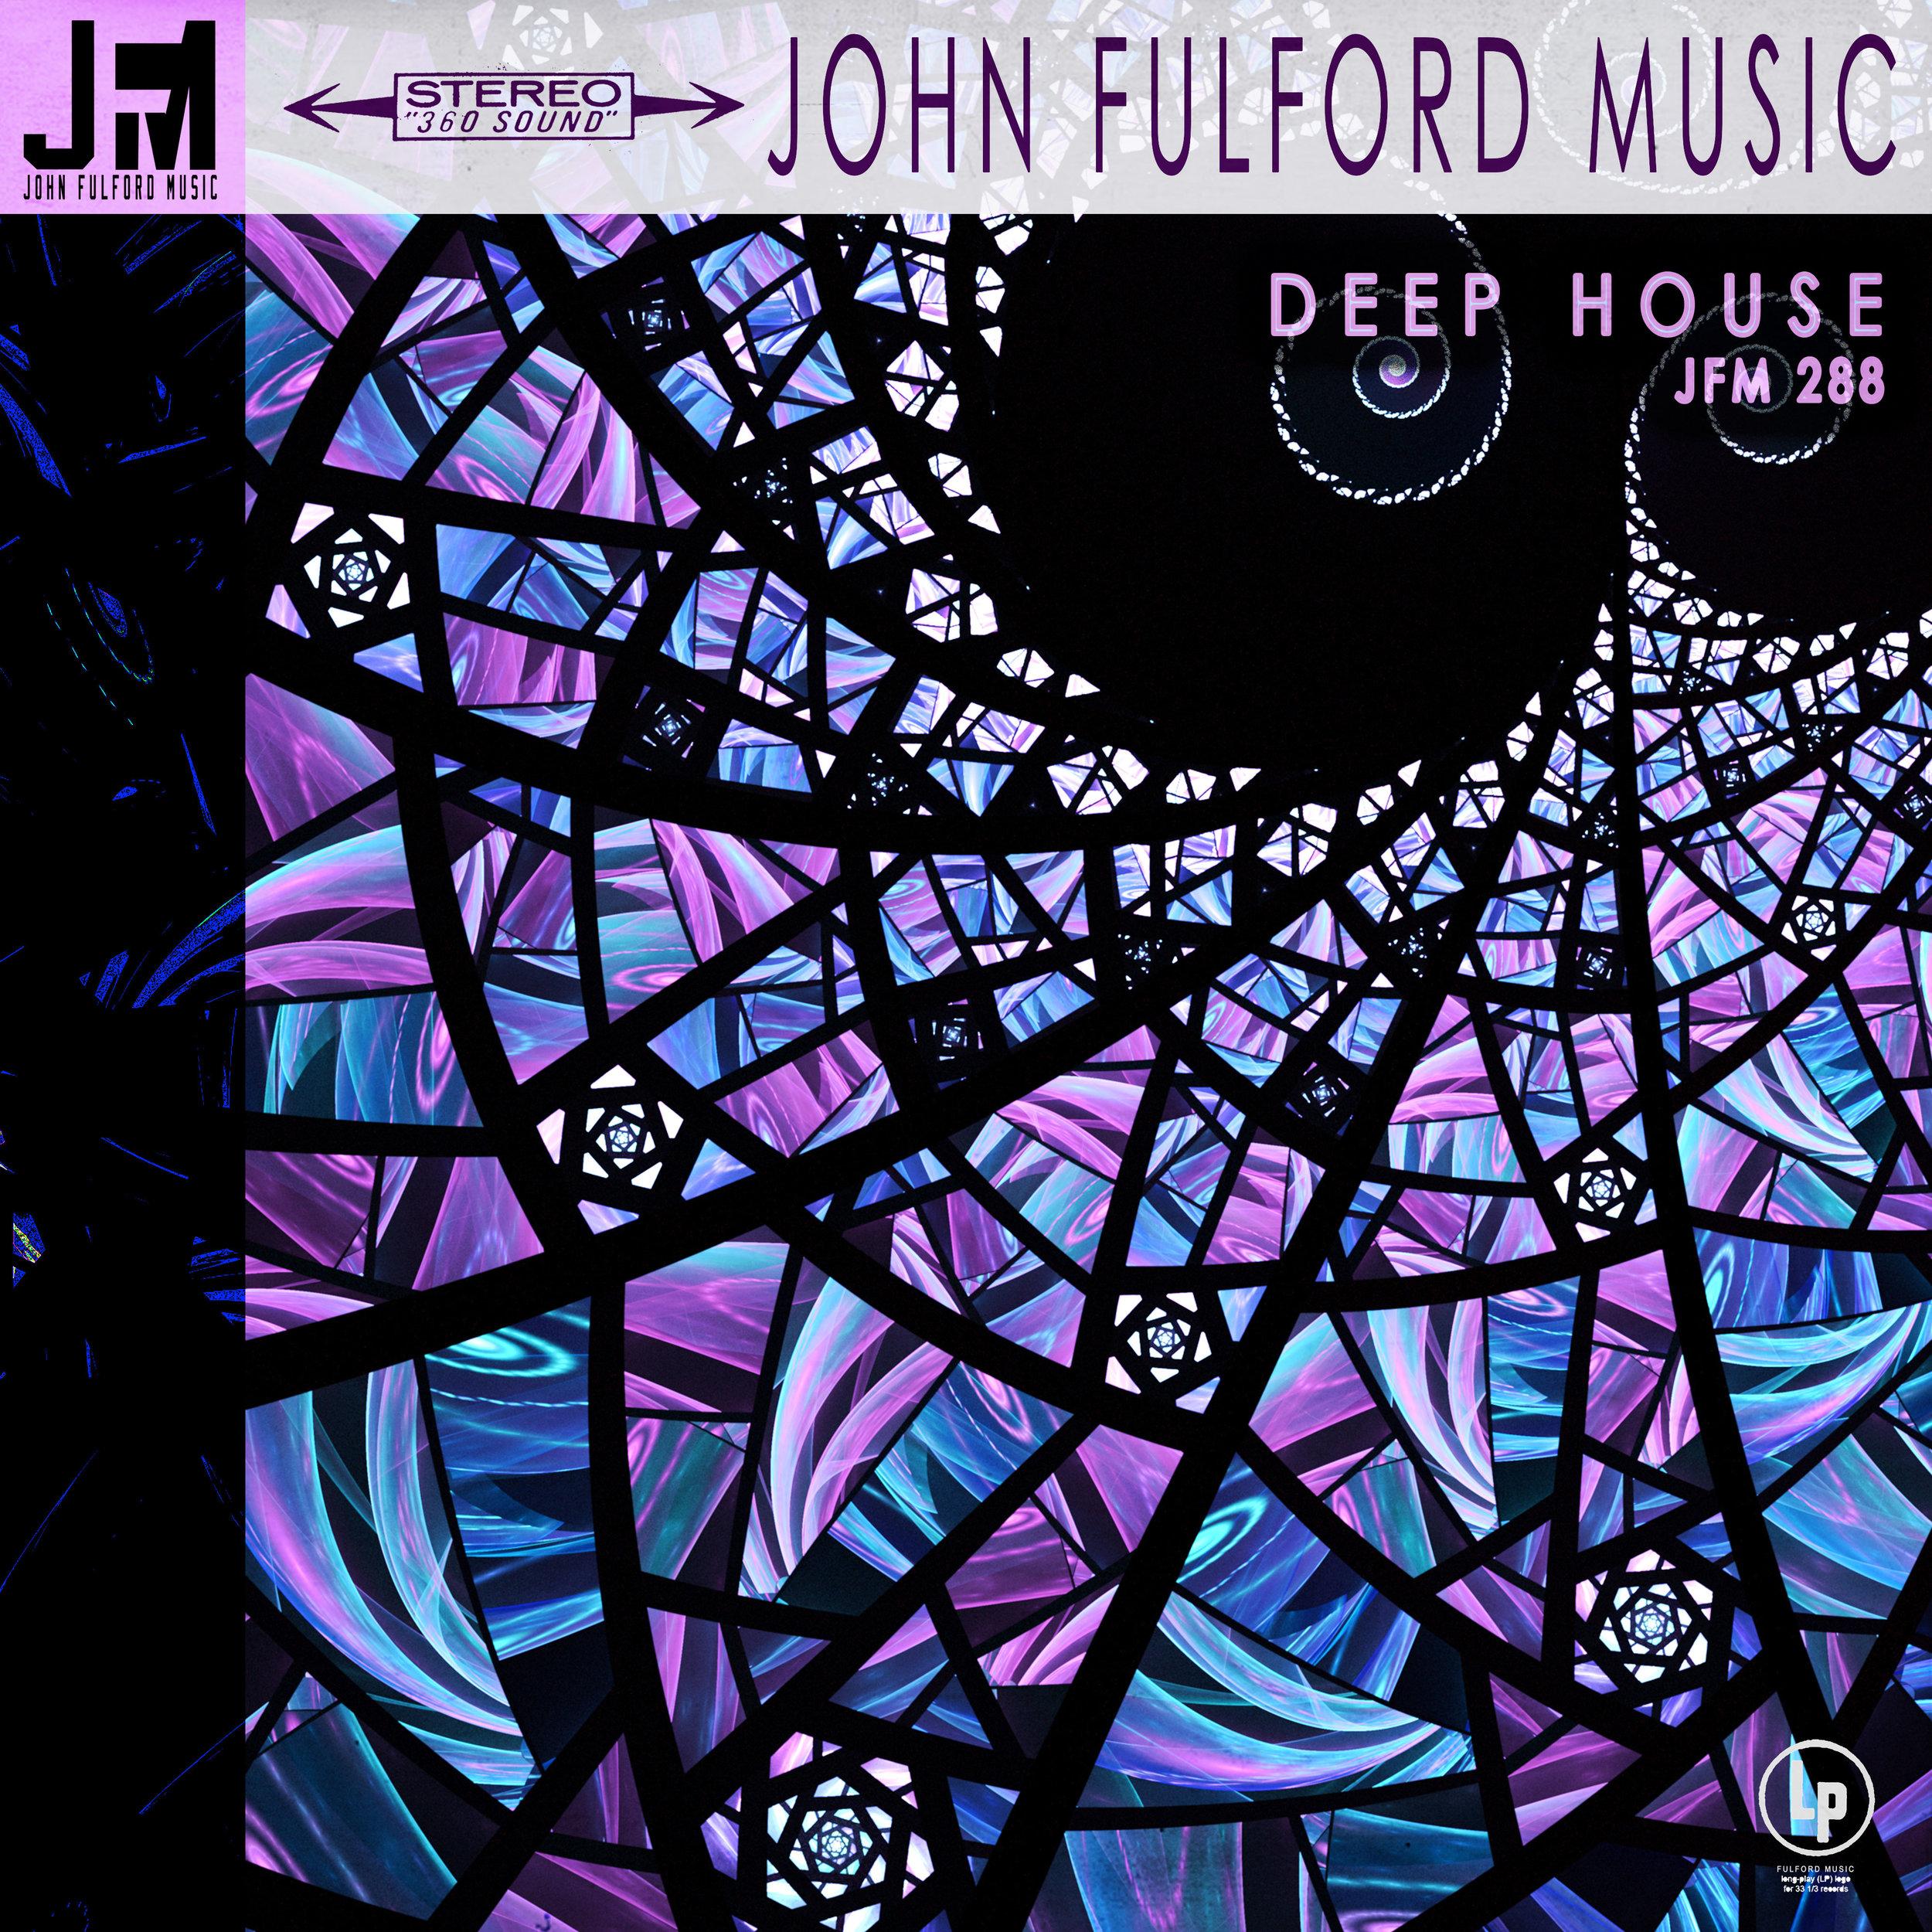 FULFORD-JFM288-Deep-House.jpg